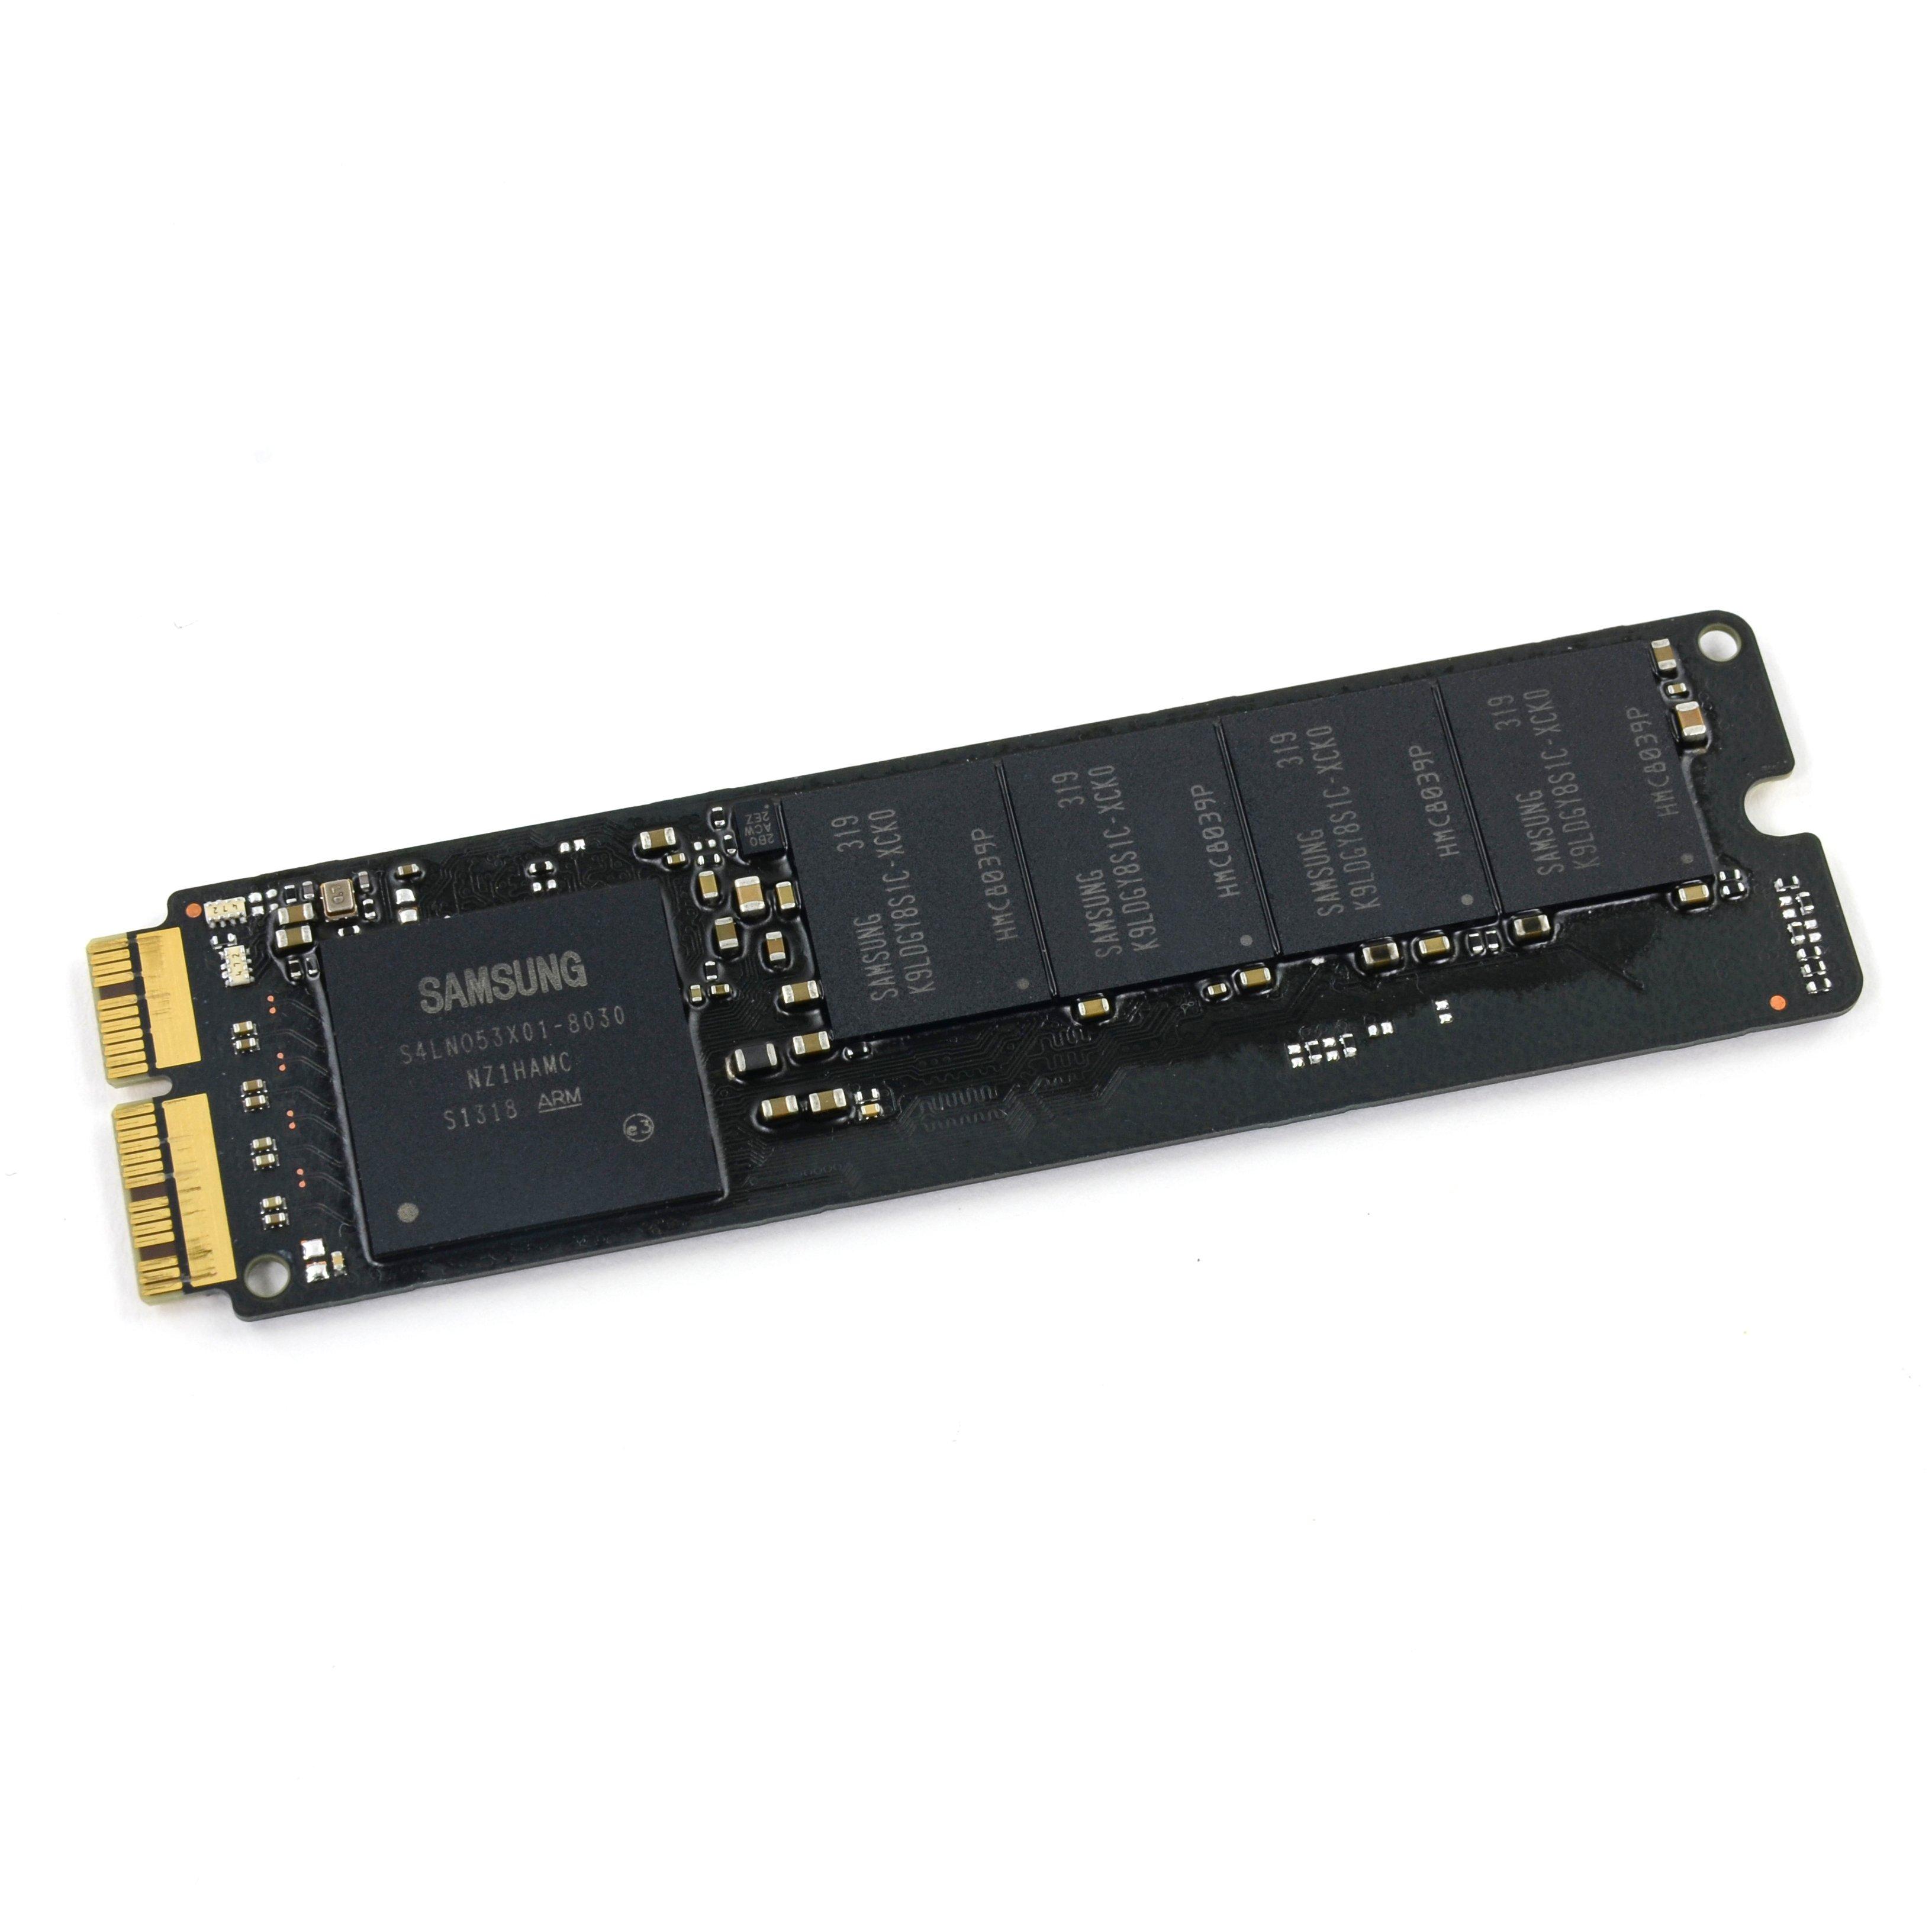 "MacBook Air 11"" (2013-2015) 13"" (2013-2017) MacBook Pro Retina 13"" and 15"" (2015) SSD Image"